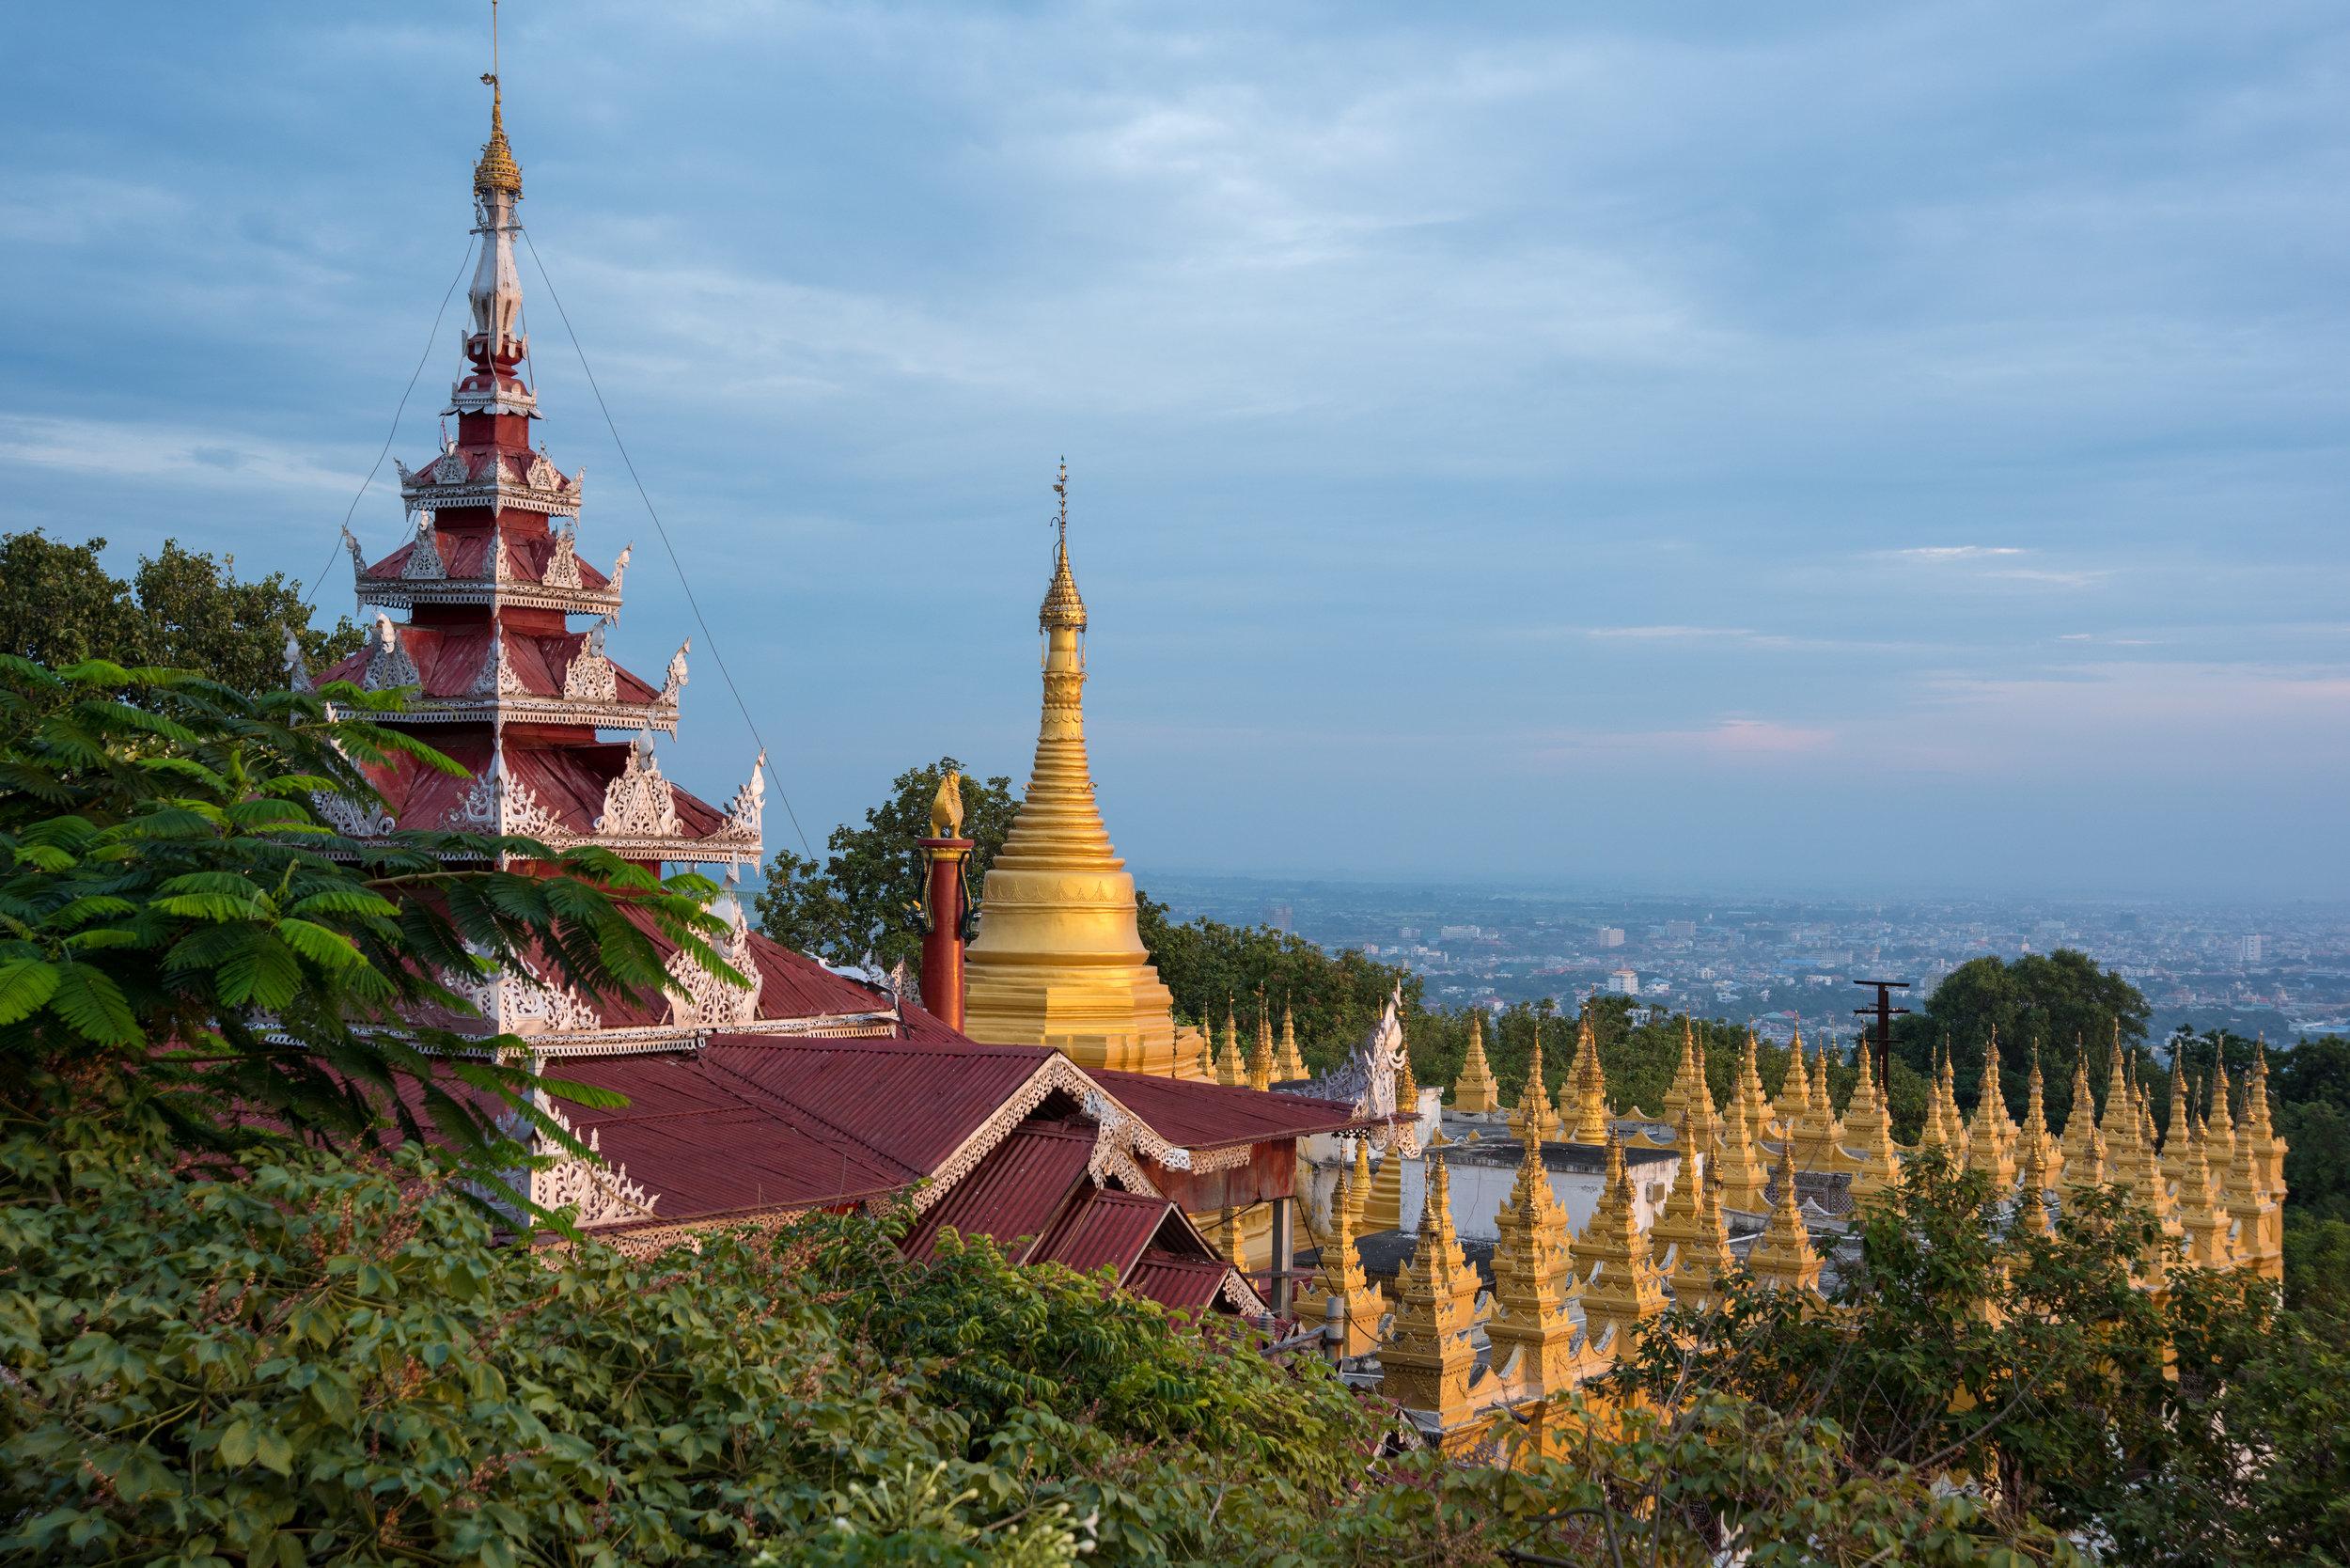 Sunset from Mandalay Hill, Mandalay, Myanmar